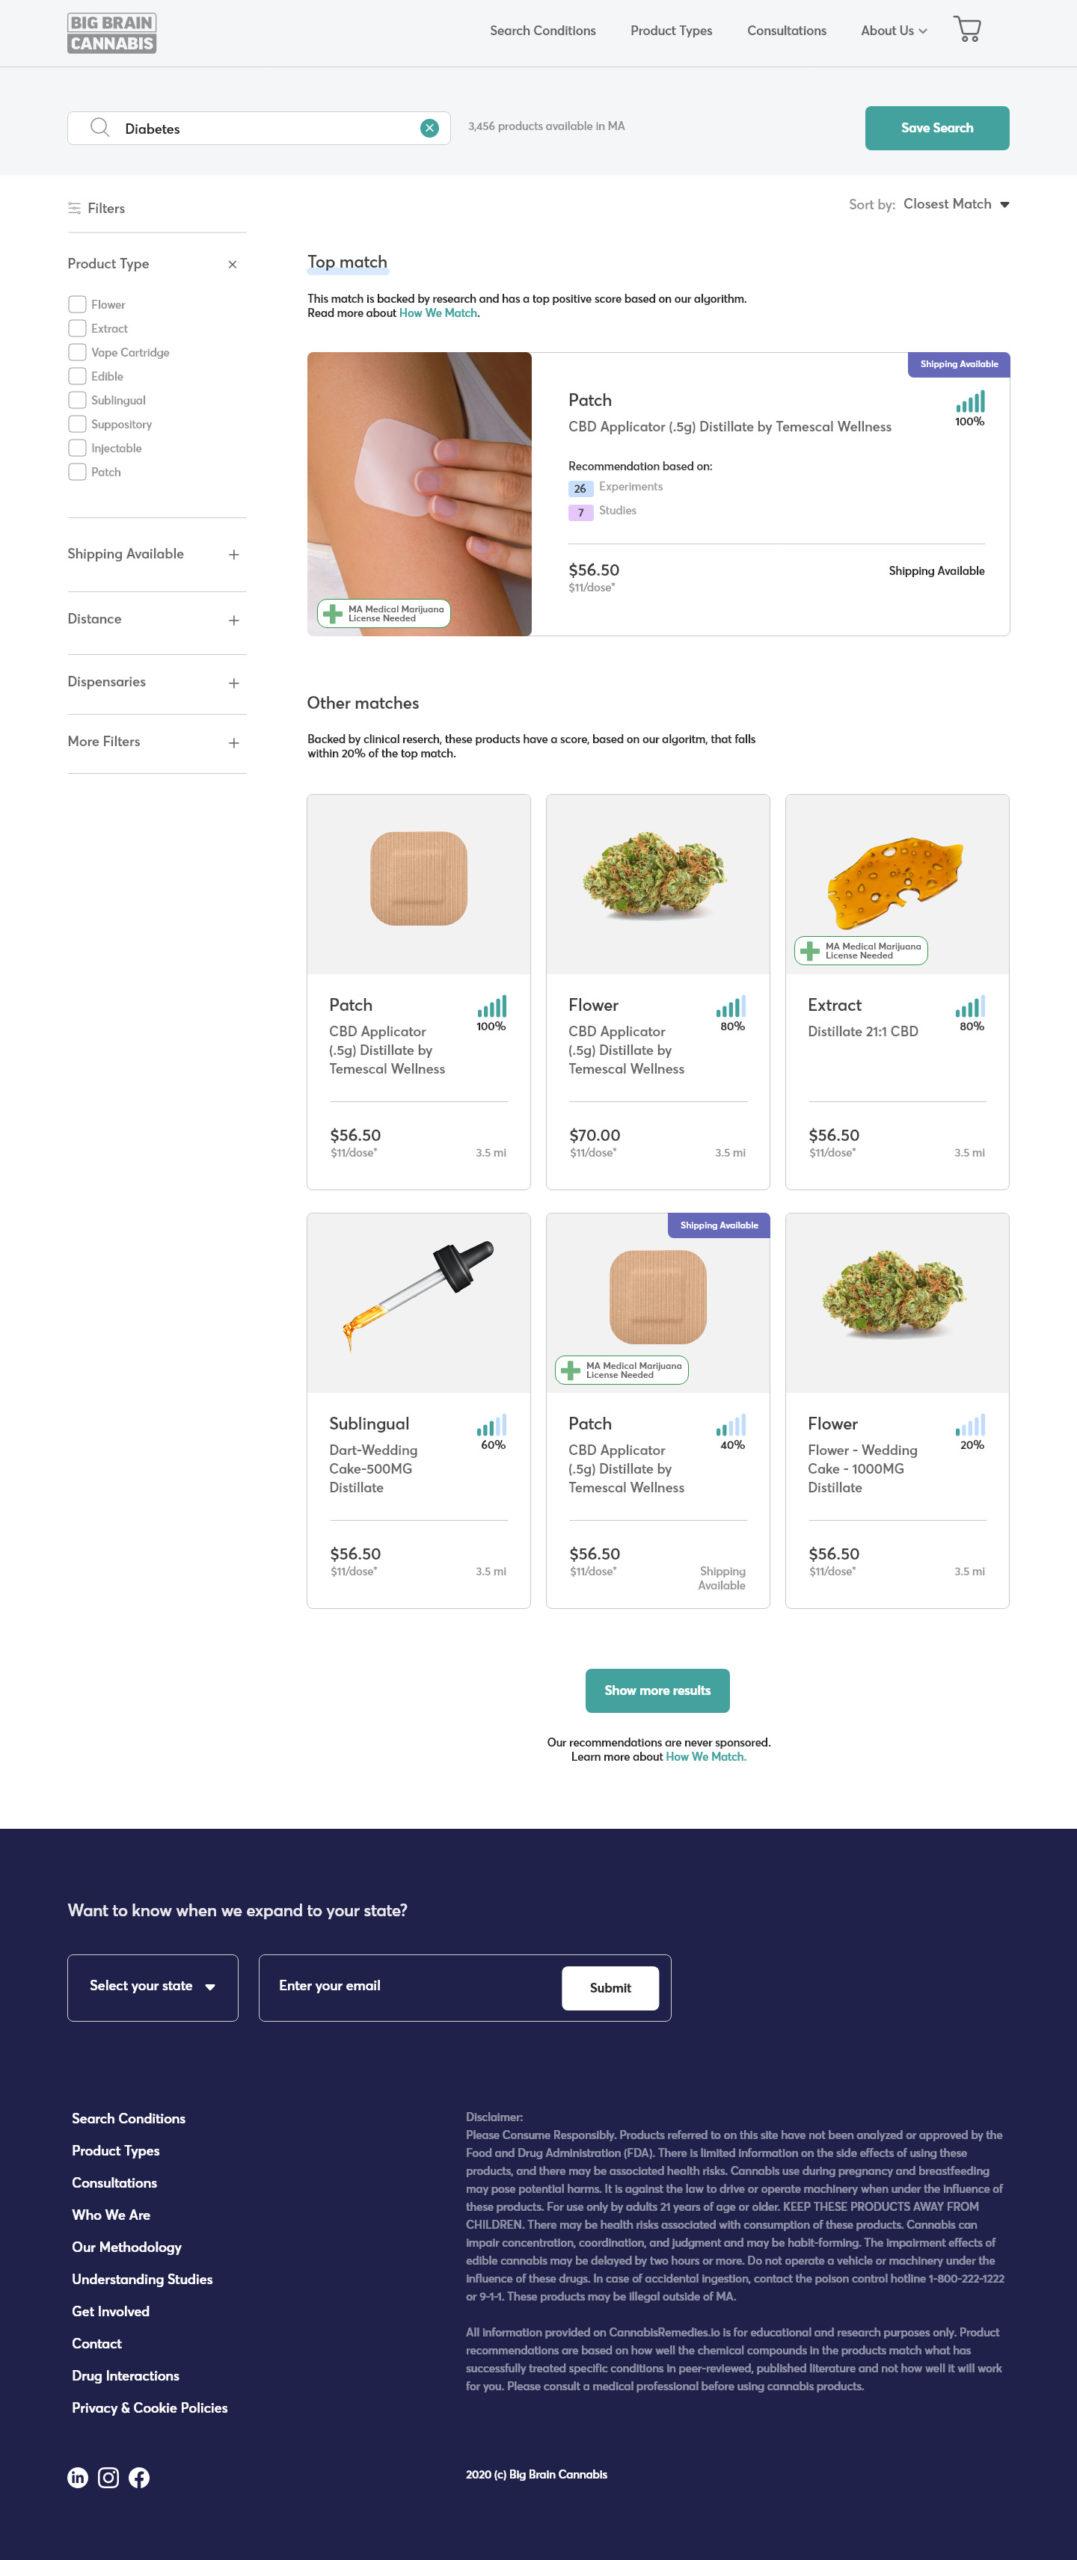 Big Brain Cannabis search results